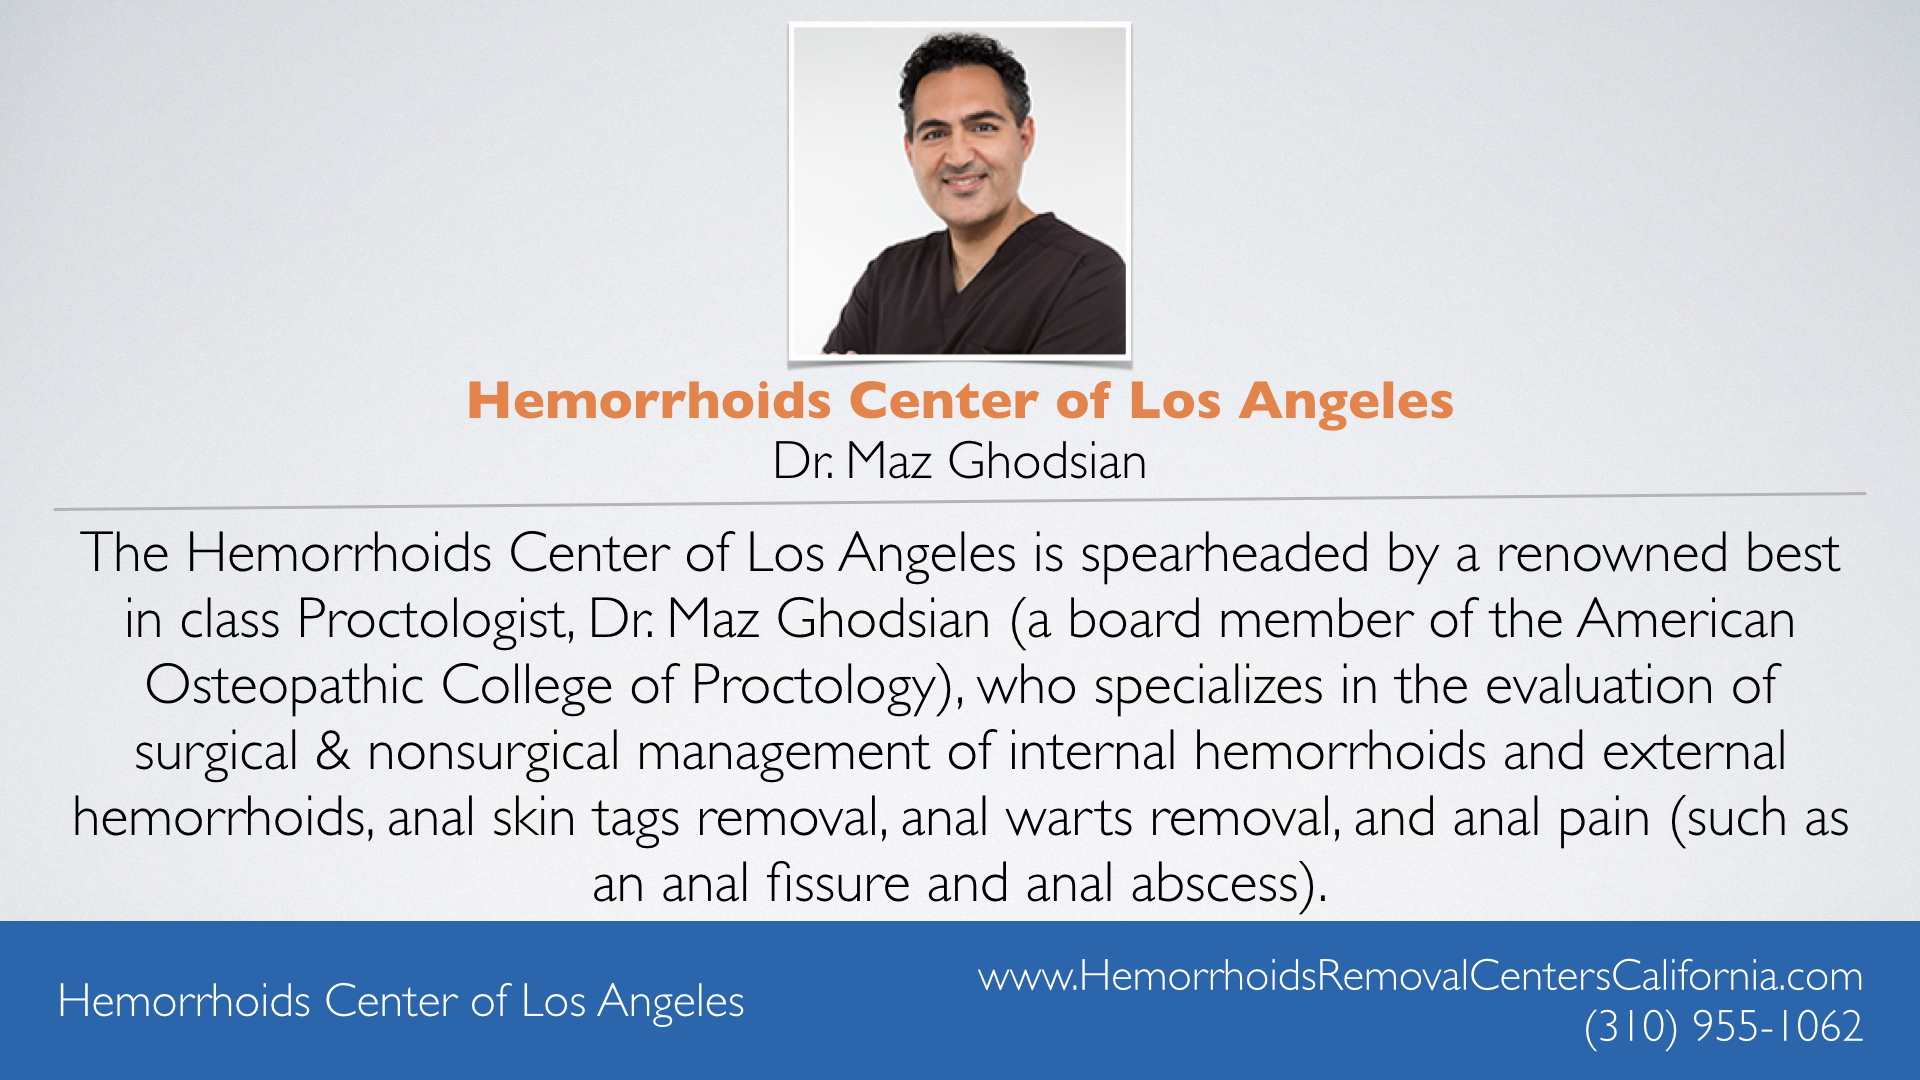 Hemorrhoids Center of Los Angeles